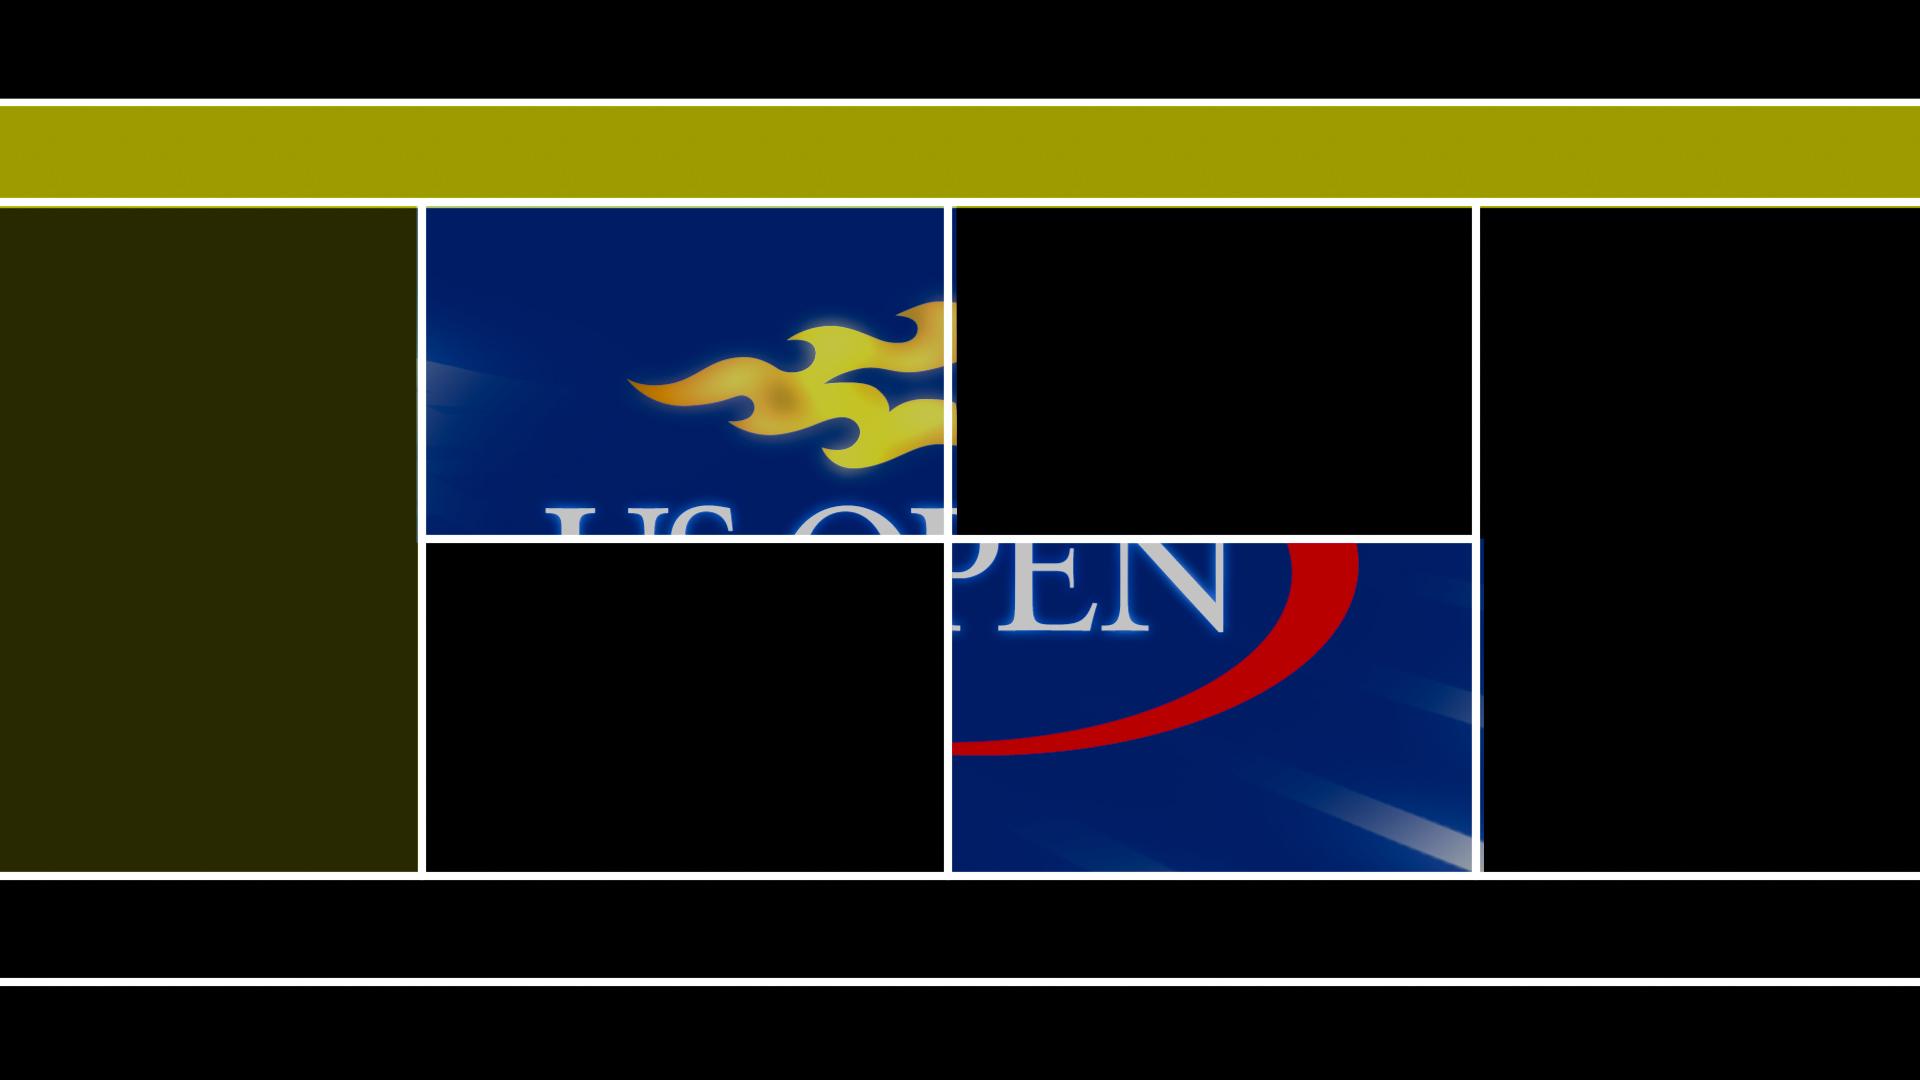 4_style_03_animation (0.00.04.12).jpg